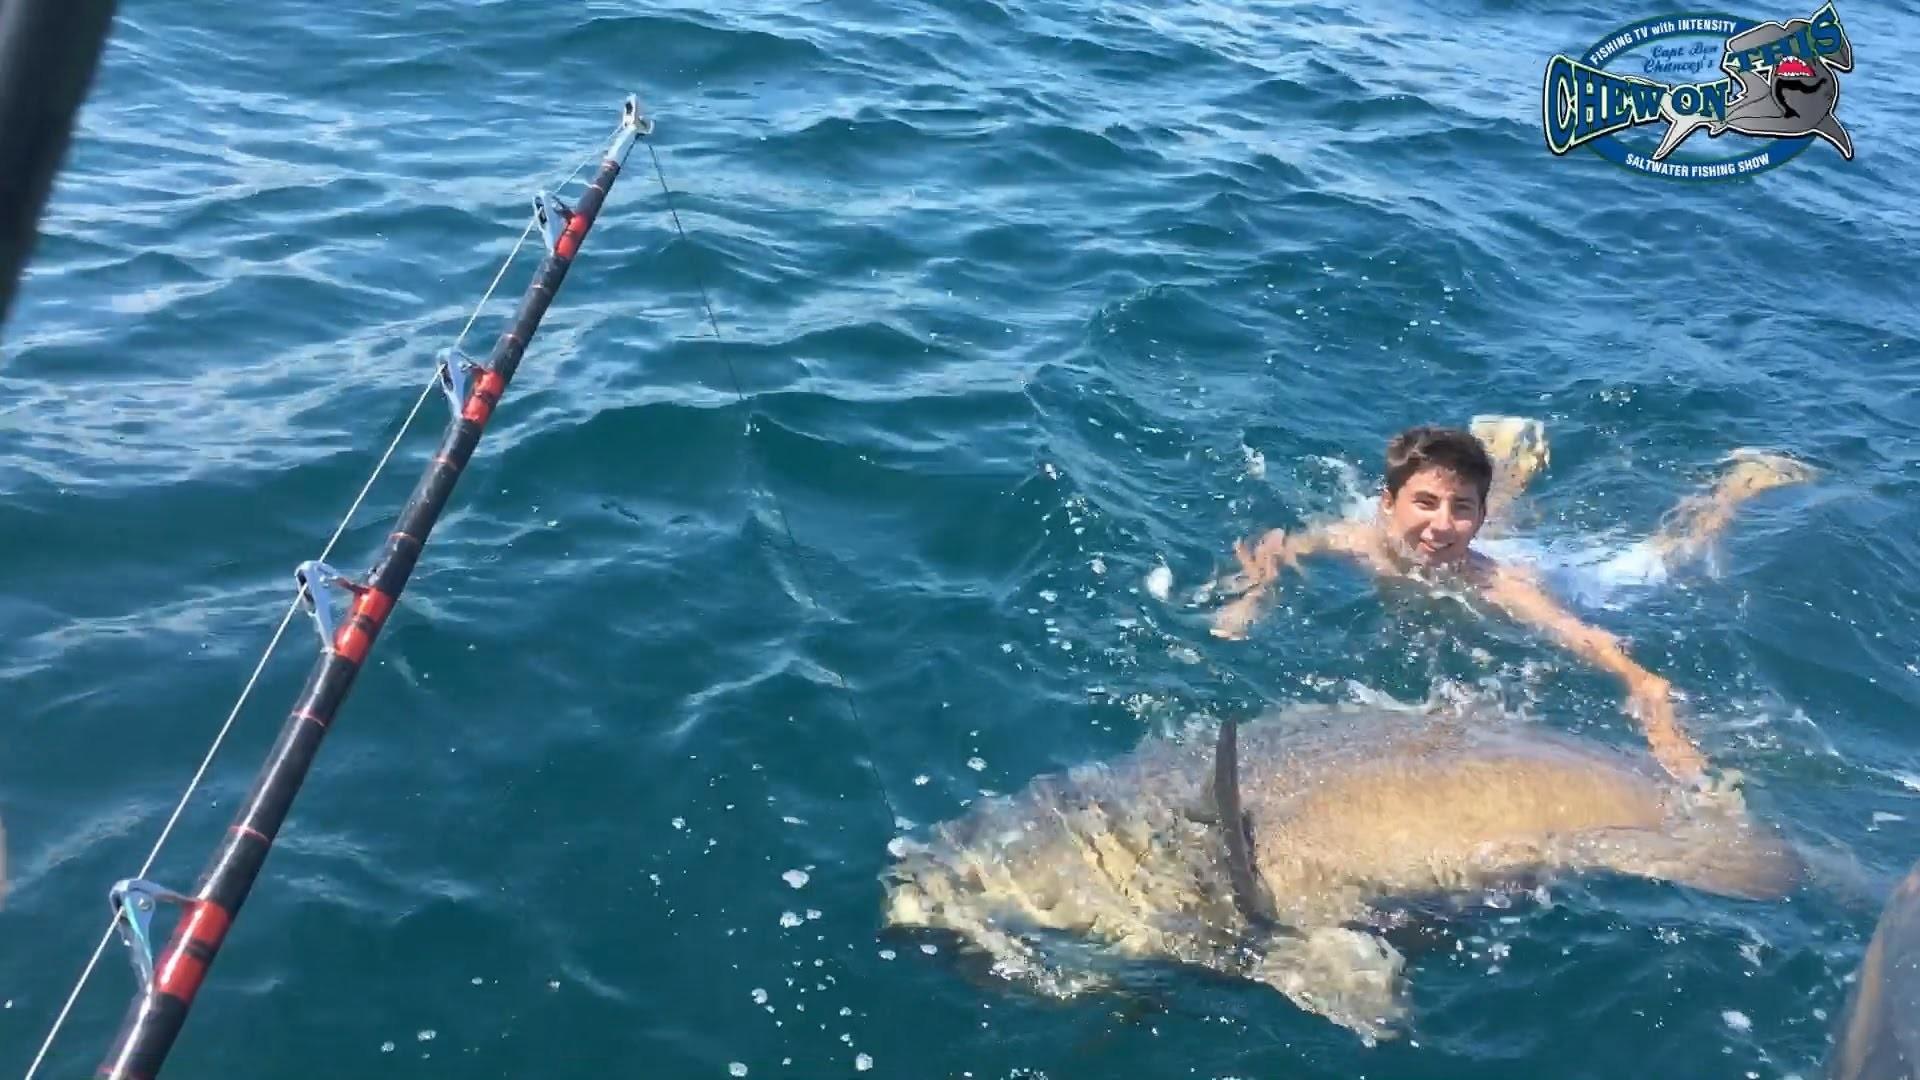 Goliath Grouper Fishing Video – Biggest Fish Of His Life! Saltwater Fishing  Big Fish – Ocean Fishing